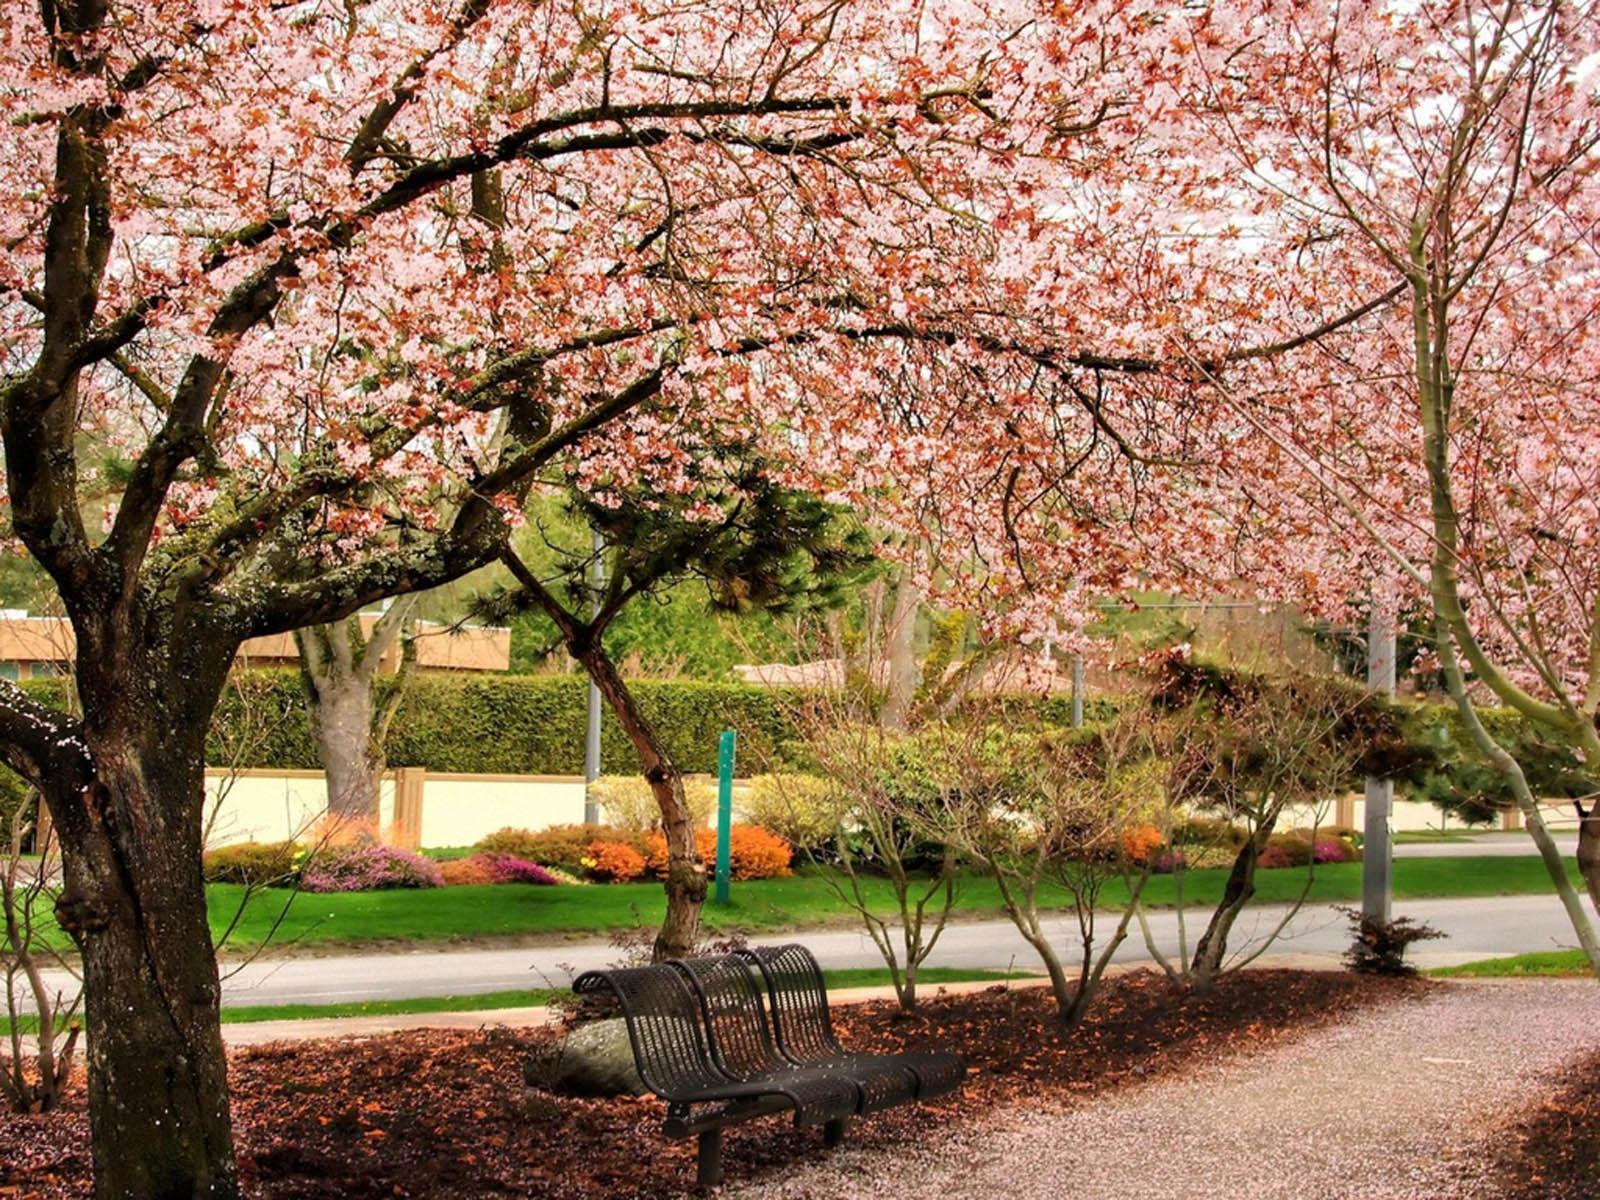 cherry blossem tree background wallpaper - photo #21